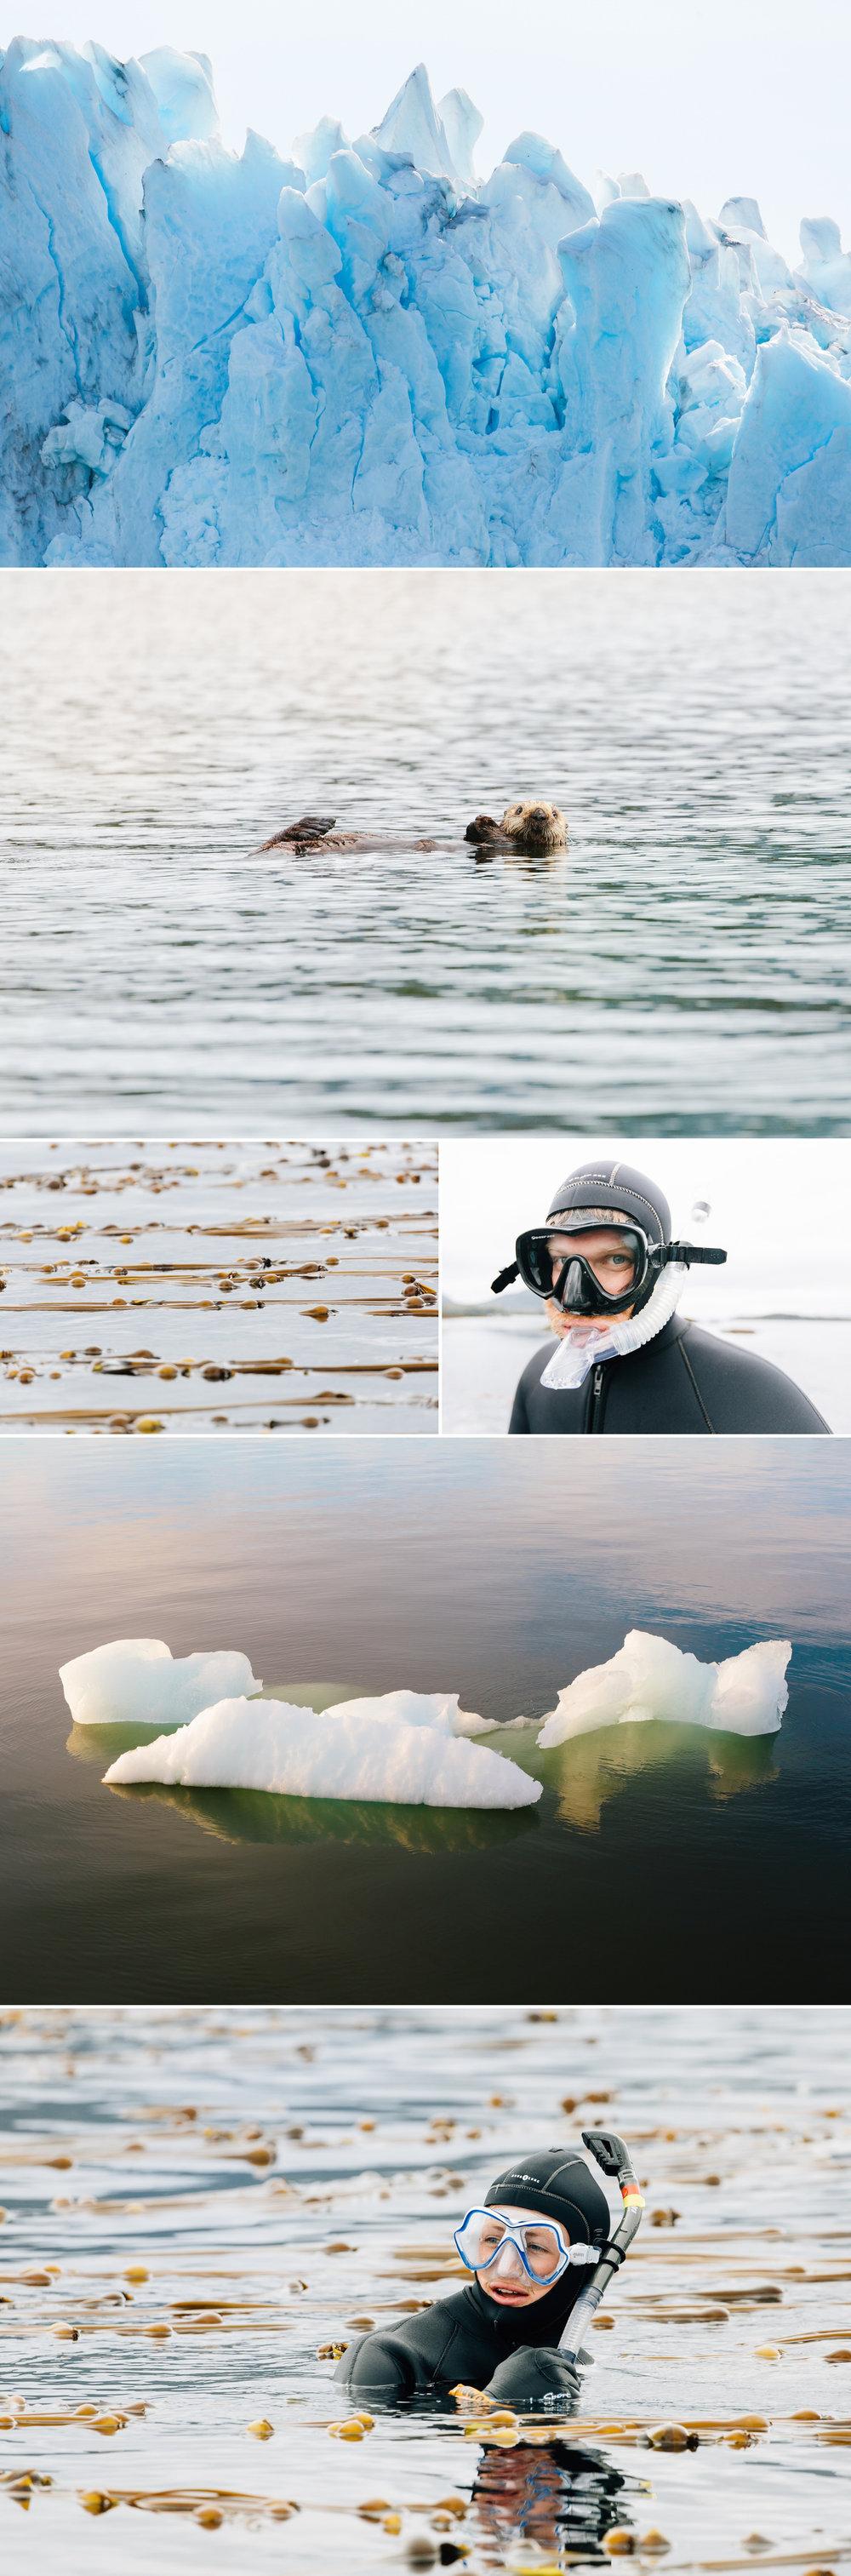 cameron-zegers-photography-alaska-uncruise-travel-11.jpg